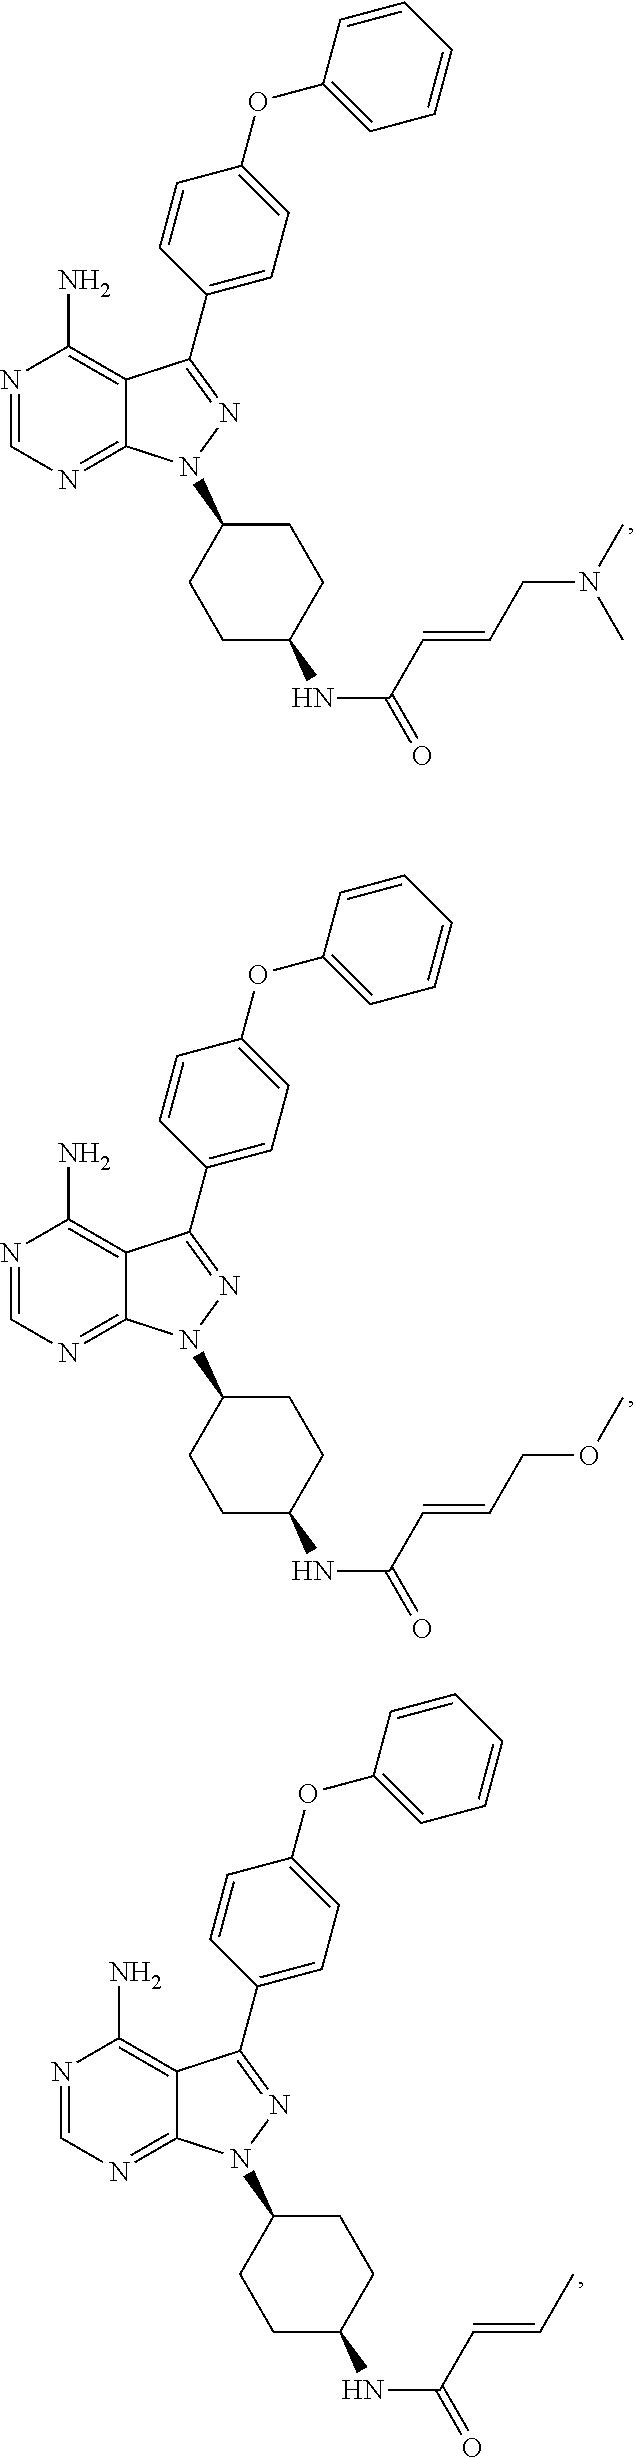 Us20120183535a1 Use Of Inhibitors Brutons Tyrosine Kinase Btk Inhale Style Mosquito Killer Lamp Electric Circuit Figure 20120719 C00032